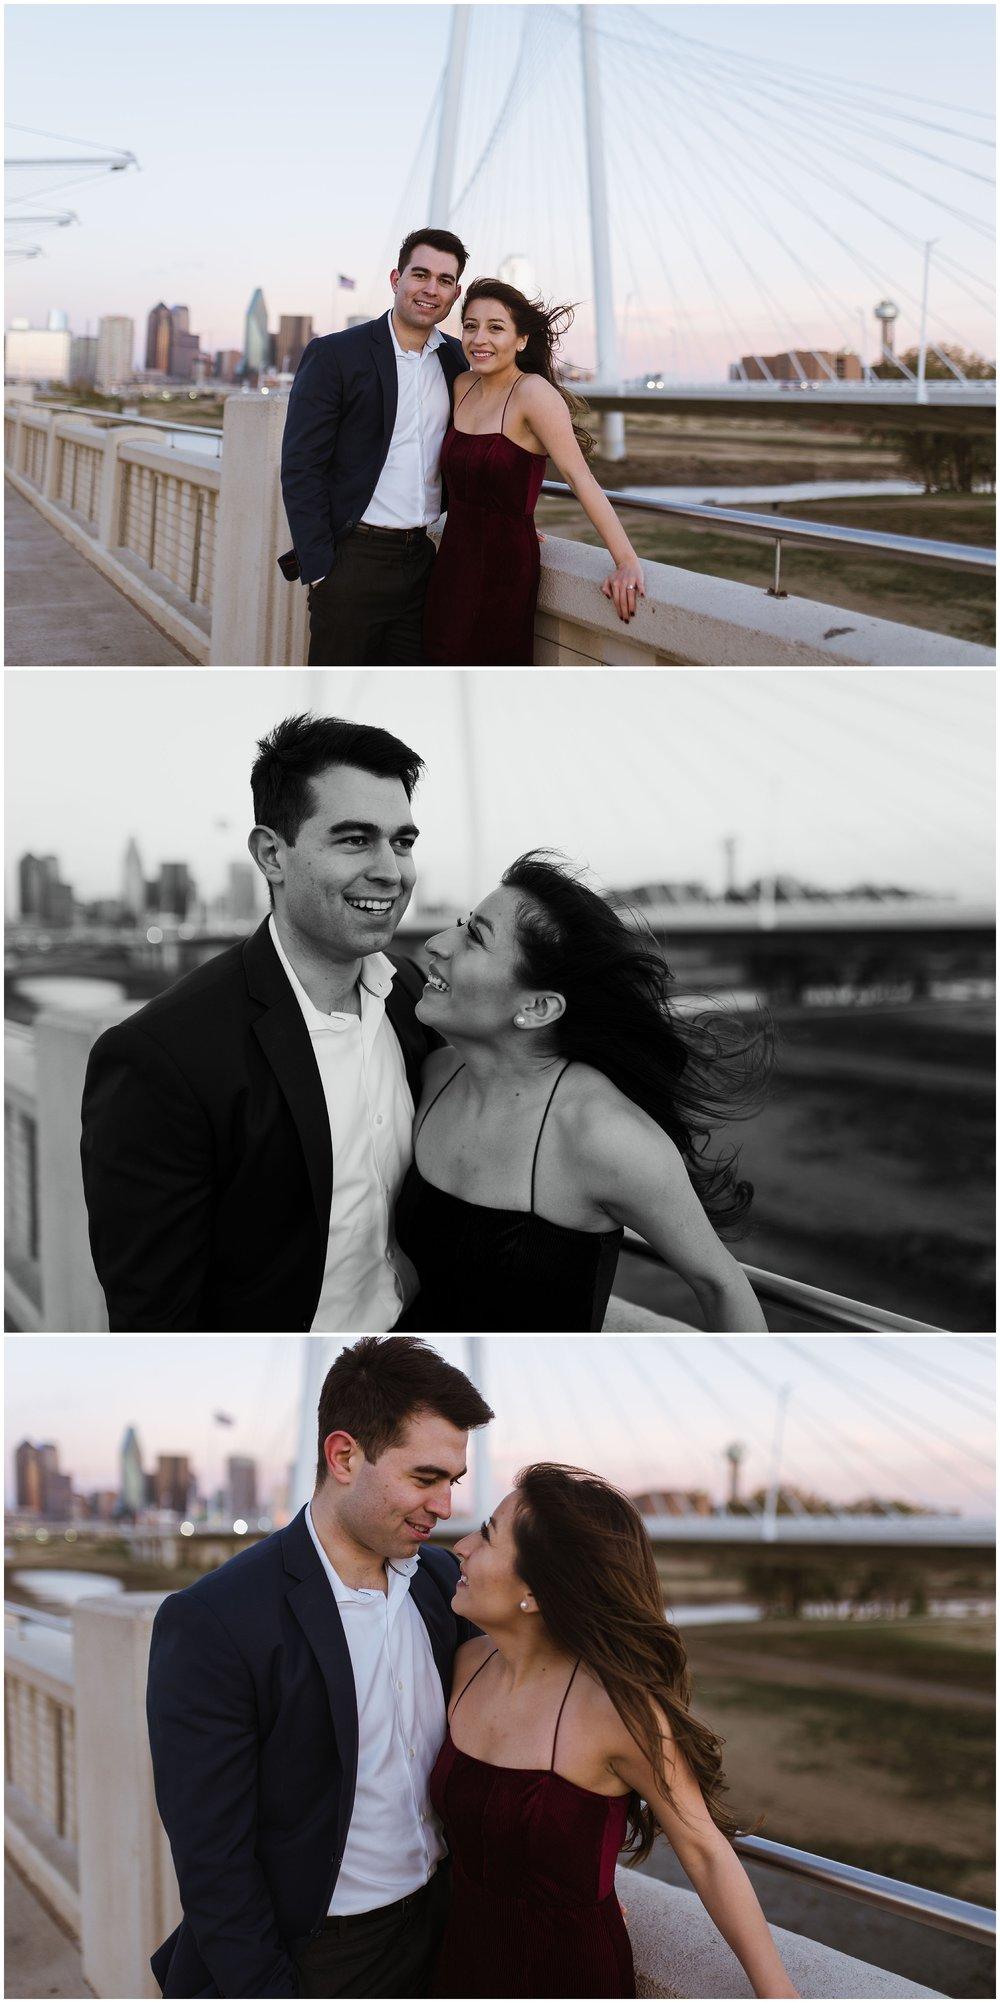 Dallas Engagement Session | Fort Worth Wedding Photographer | Dallas Wedding Photographer | www.jordanmitchellphotography.com